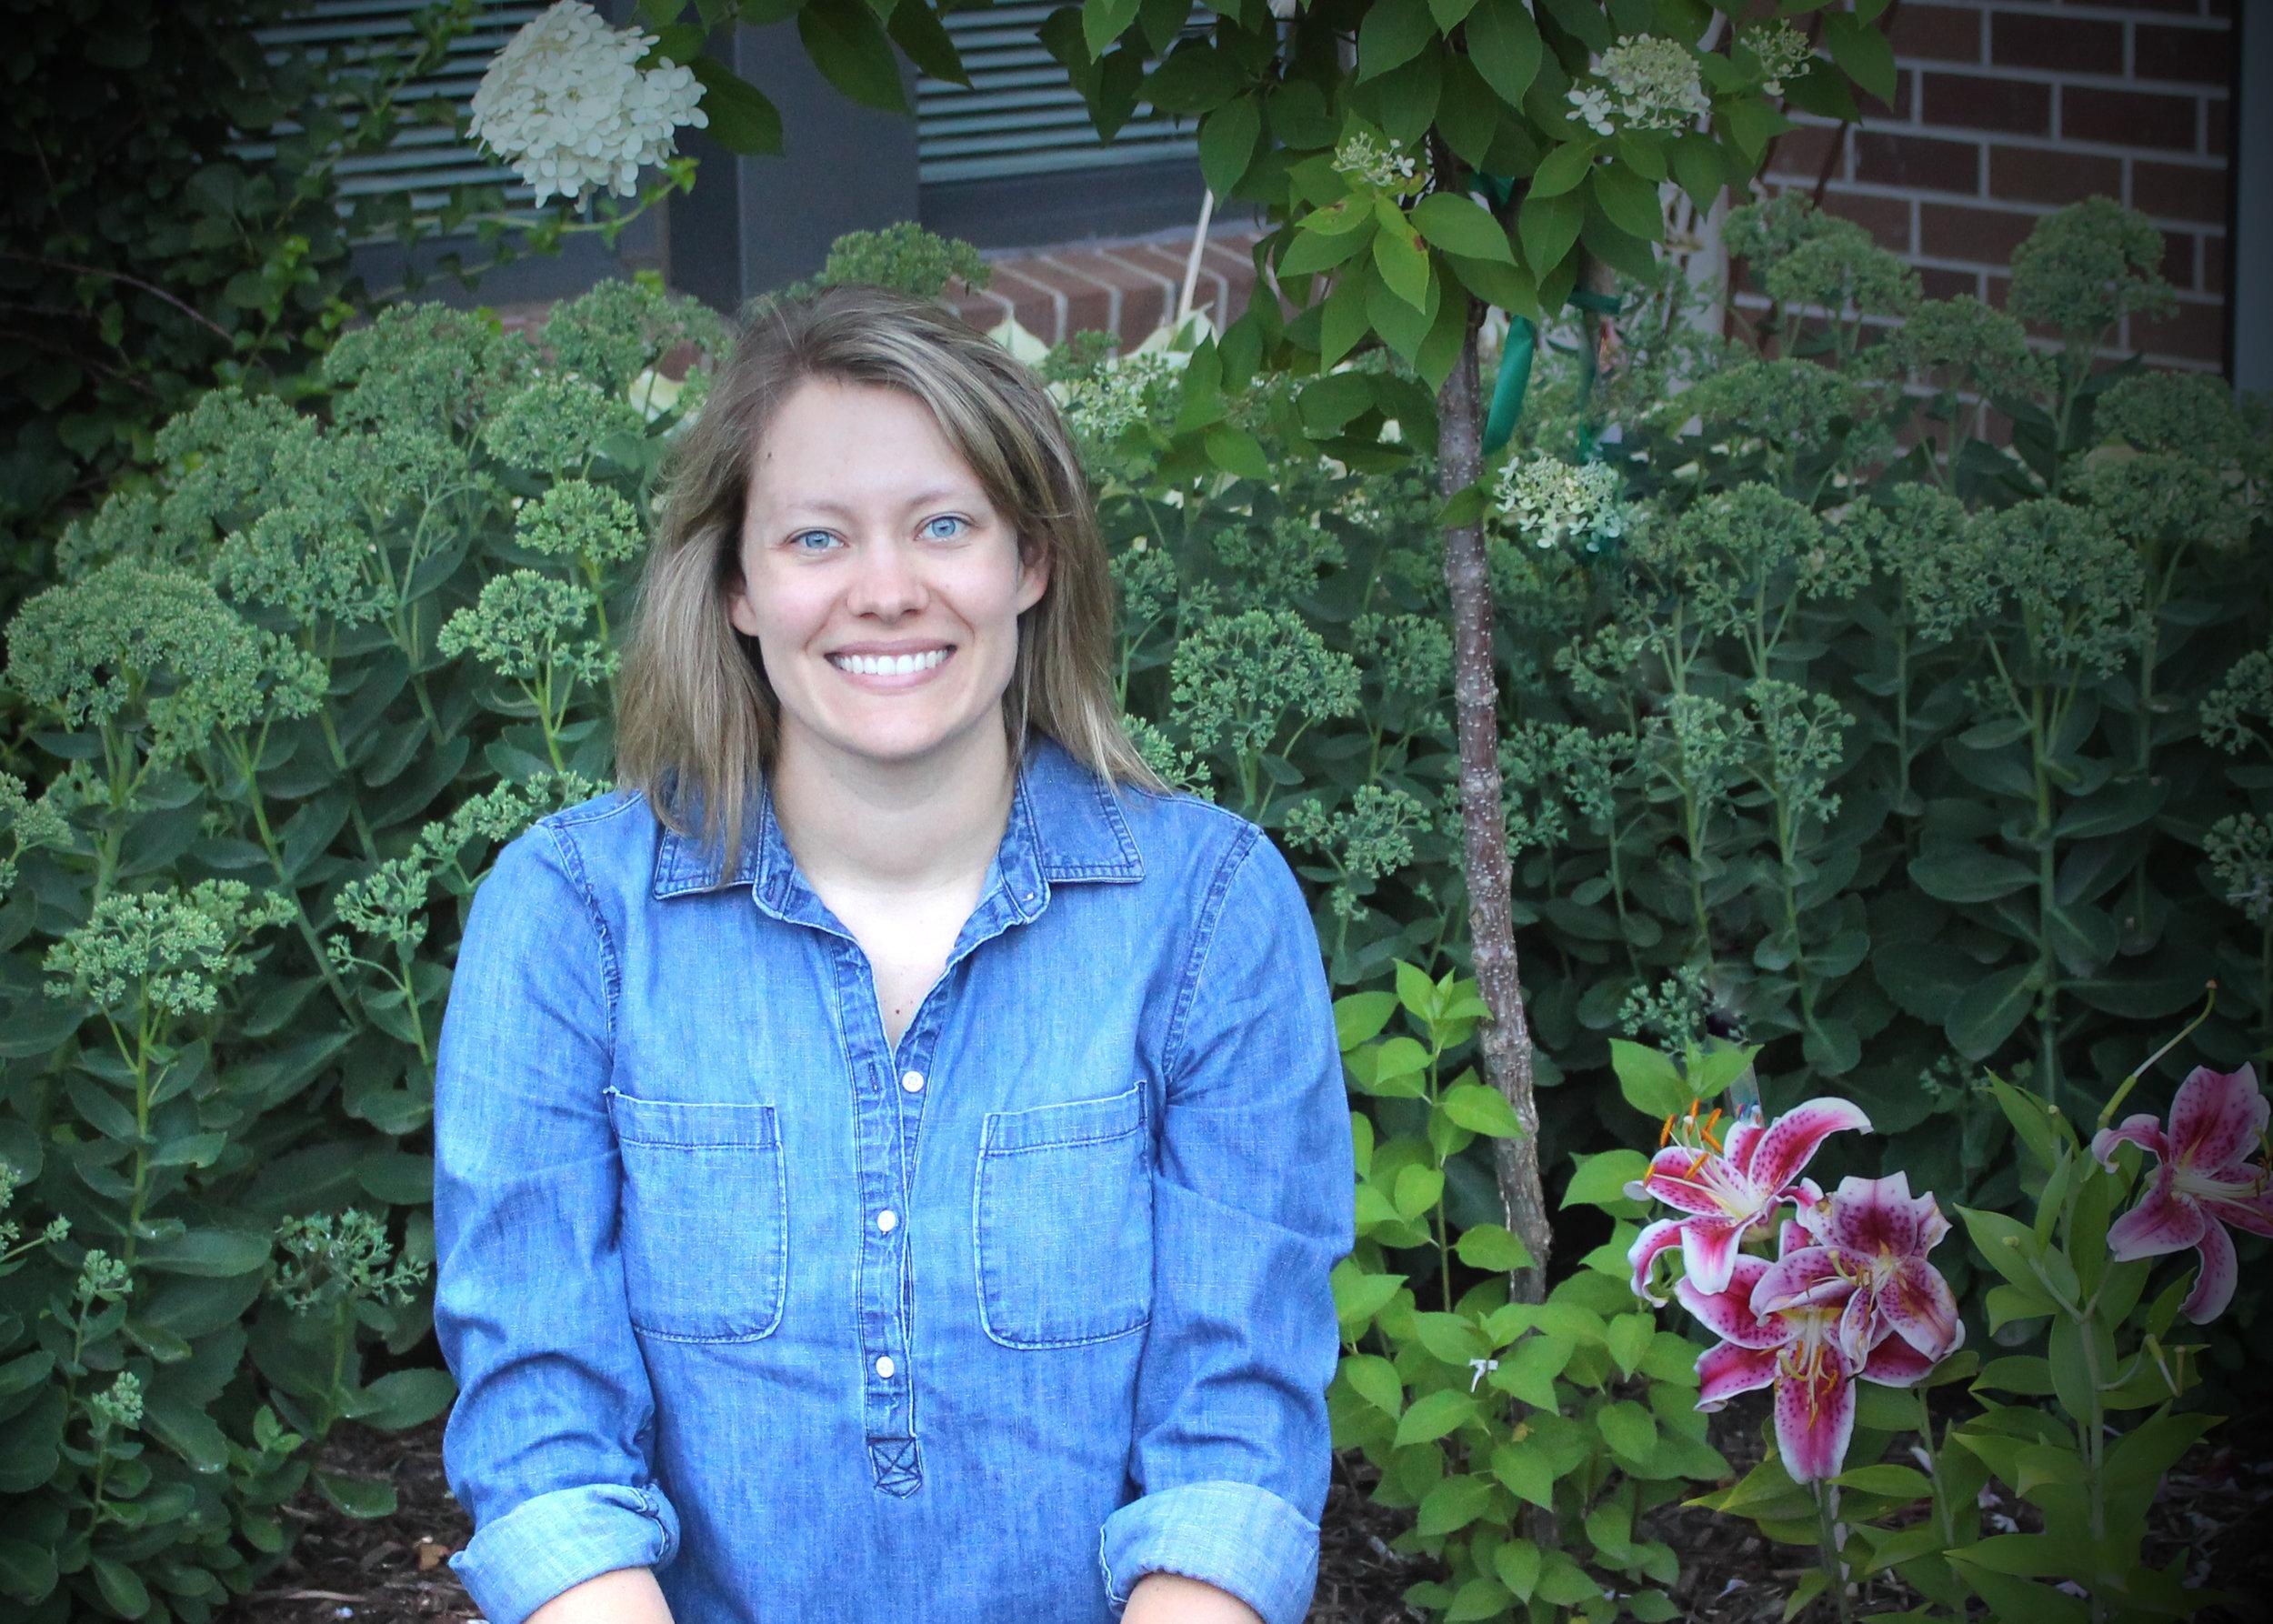 Krista Monson - Contributing Director of Children, Youth & Family Ministrieskristam@gloria-dei.com